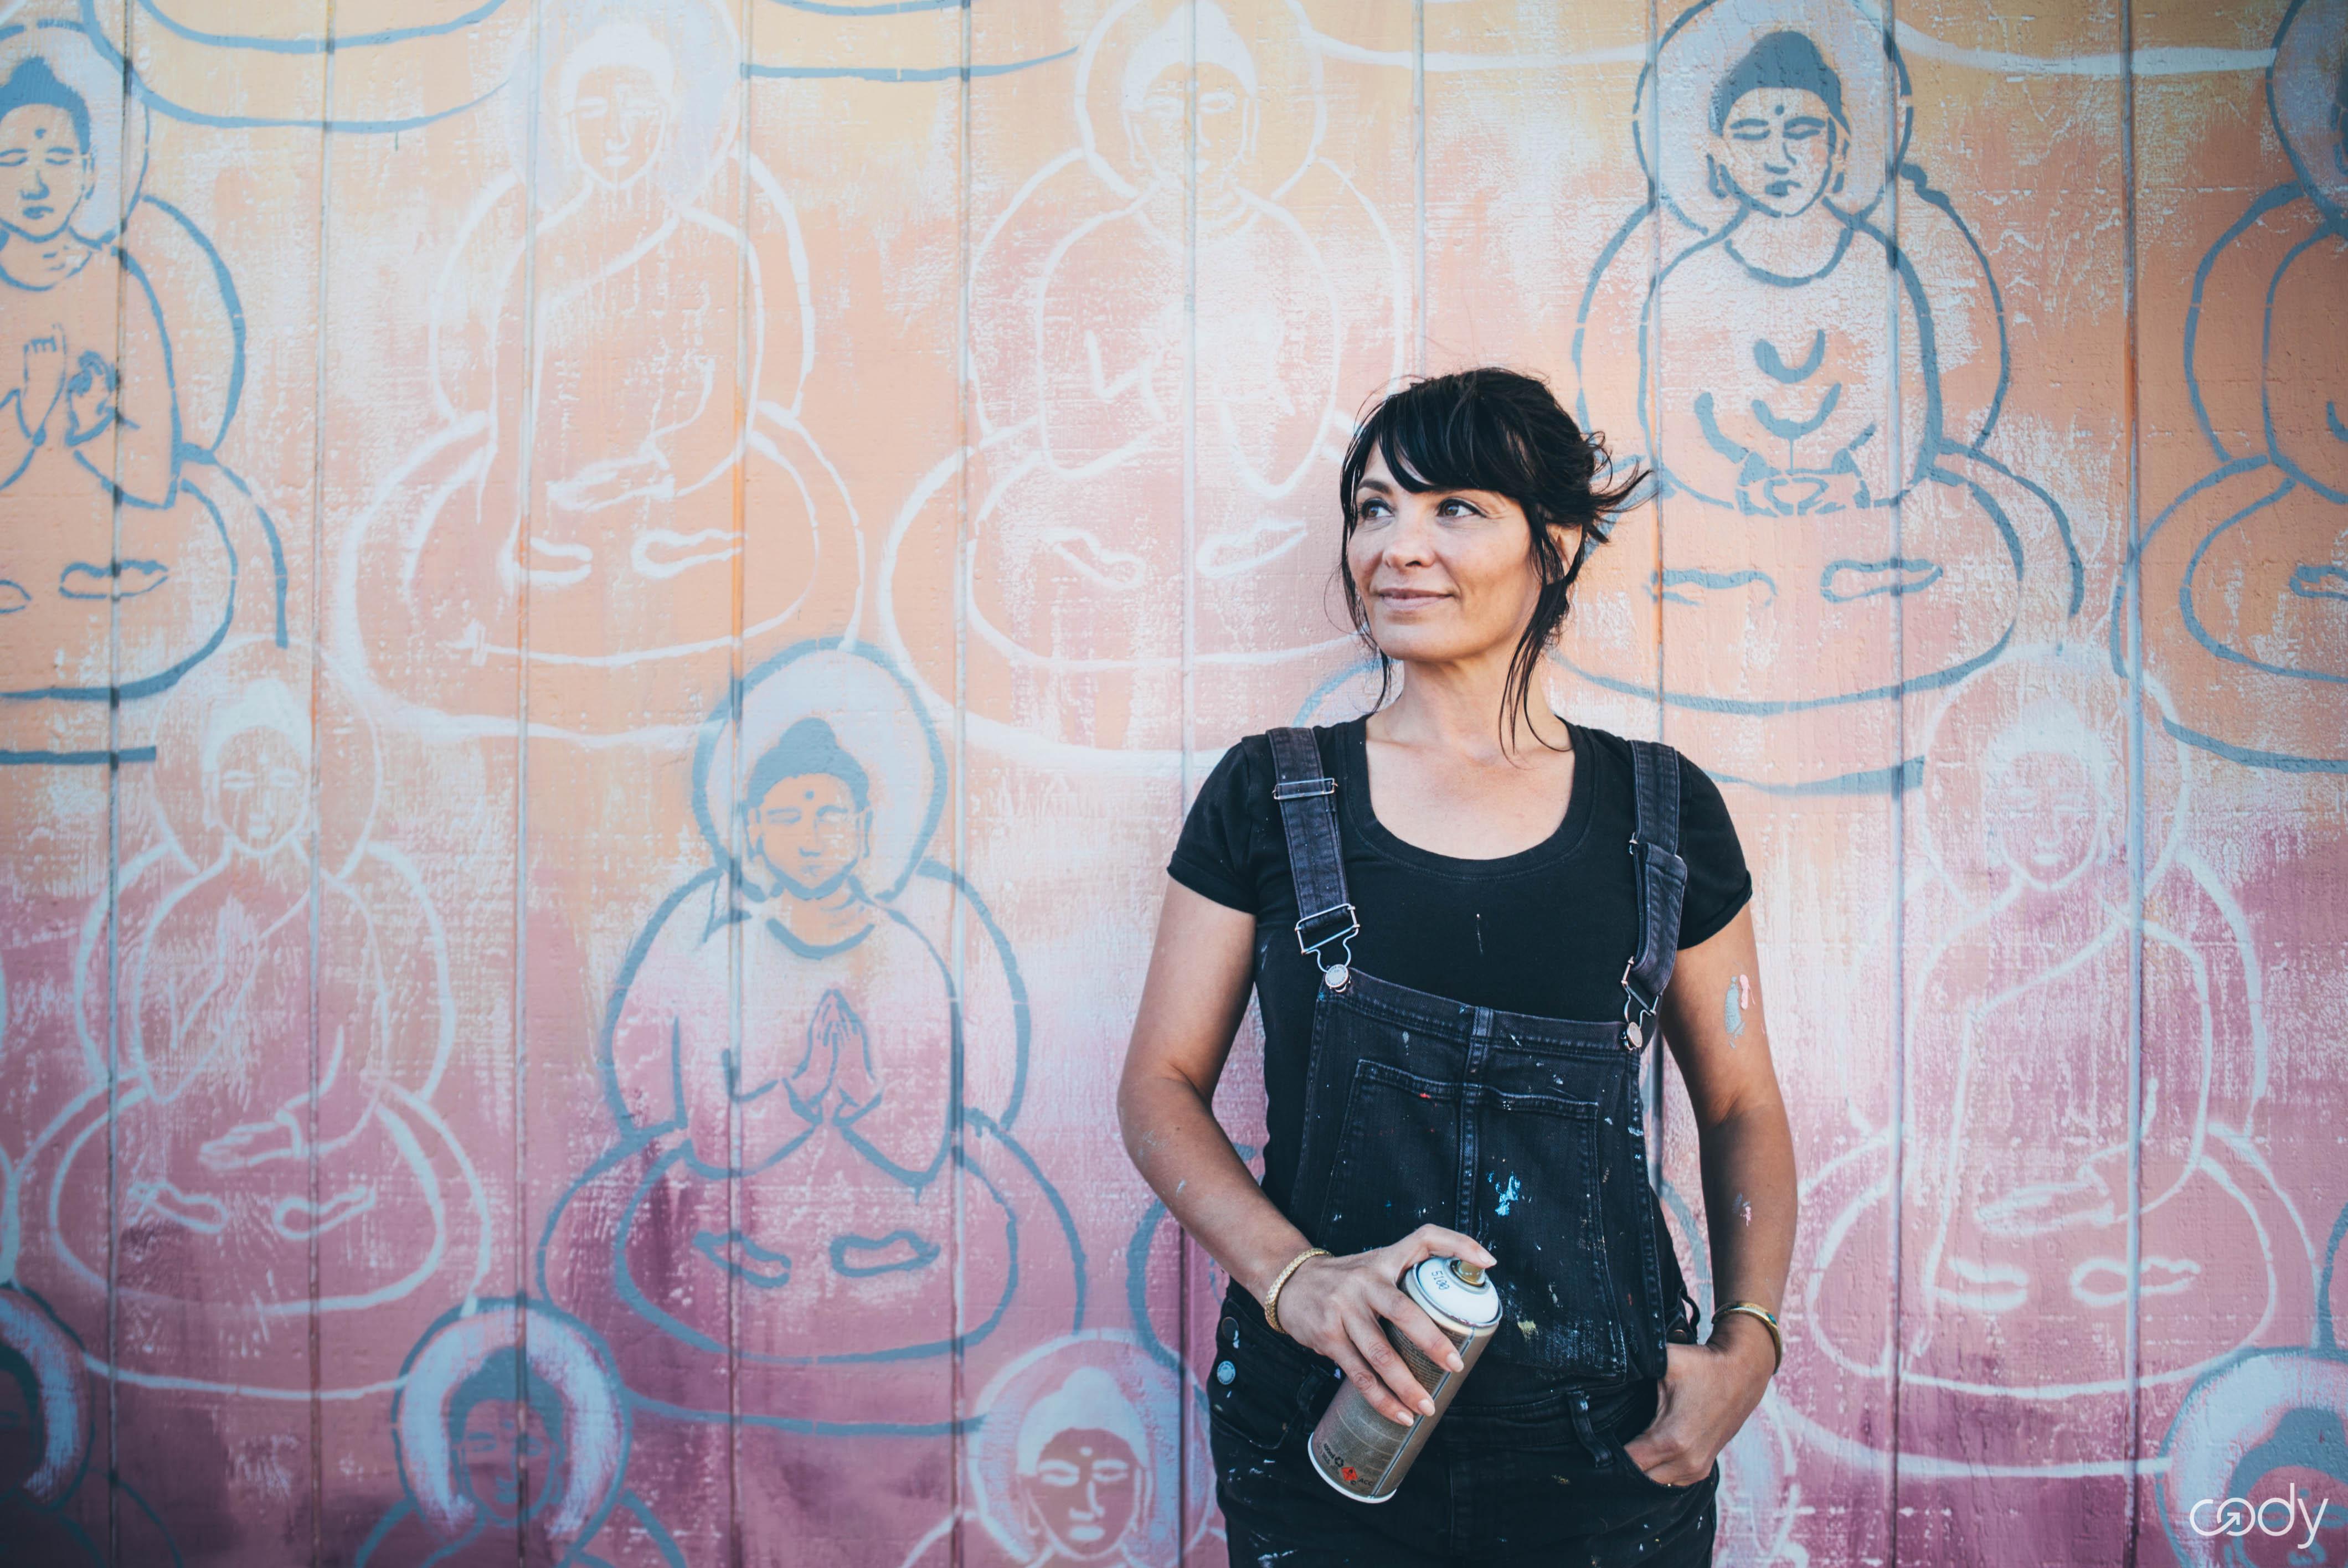 Amanda Giacomini and the 10,000 Buddhas Project. Credit: Cody App